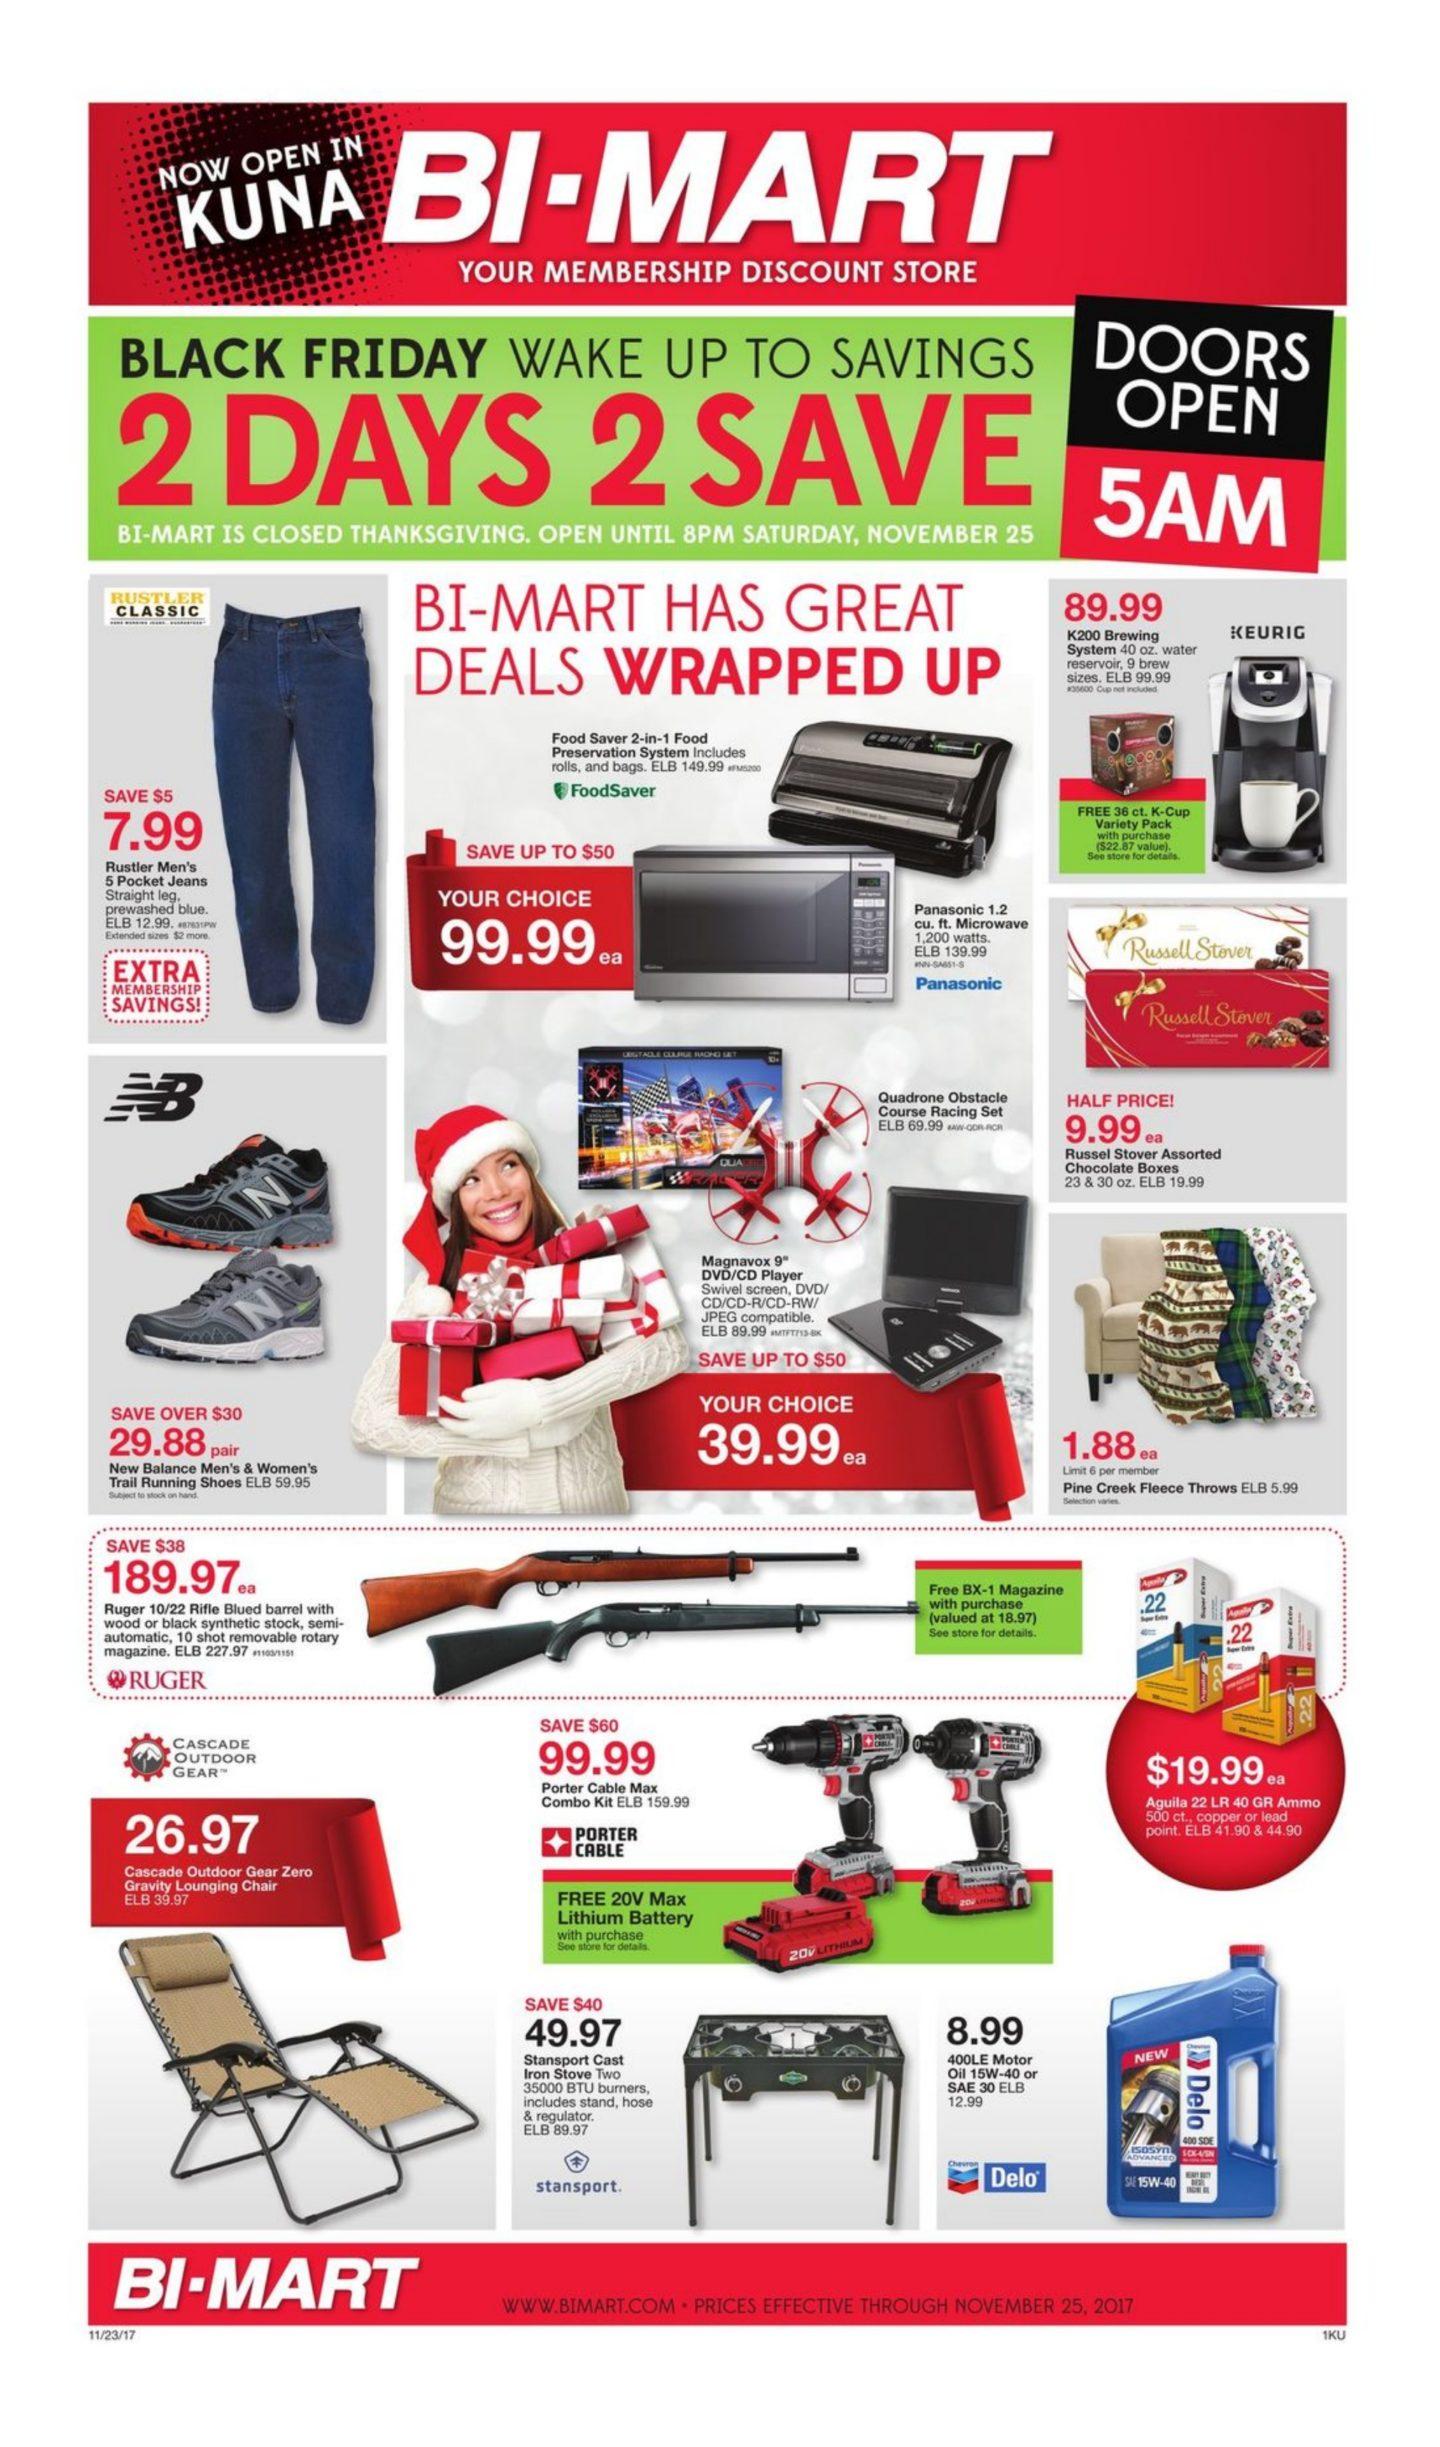 fdac0c4bb Bi-Mart Black Friday Ad 2017